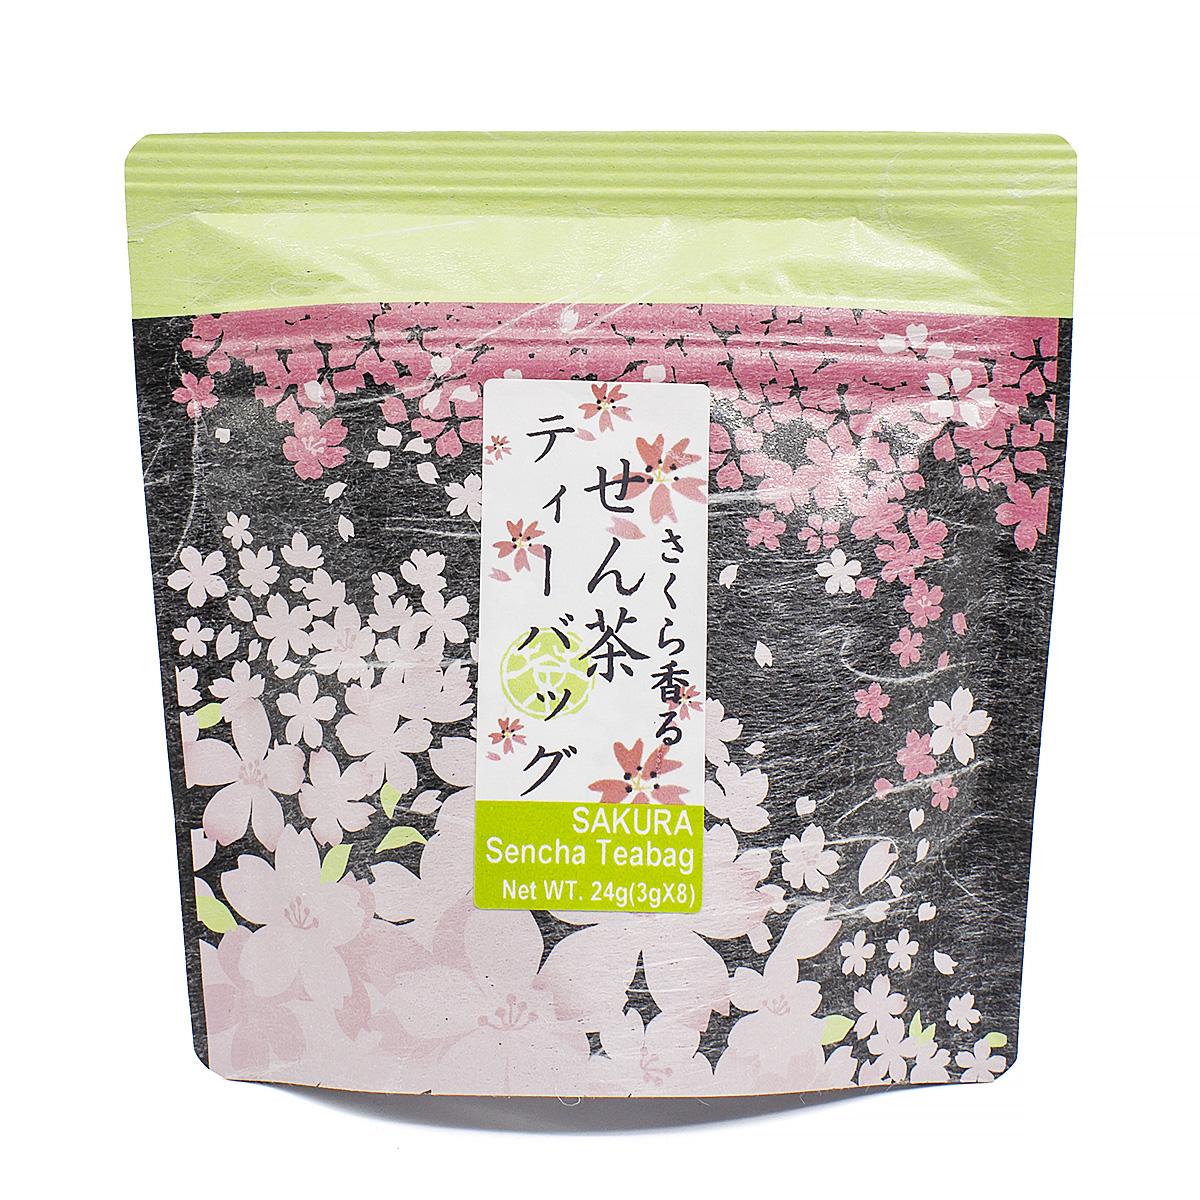 Чай зеленый Сакура Сенча в пакетиках, 3 шт х 8 г нож гюрза 2 сталь d2 граб резной page 2